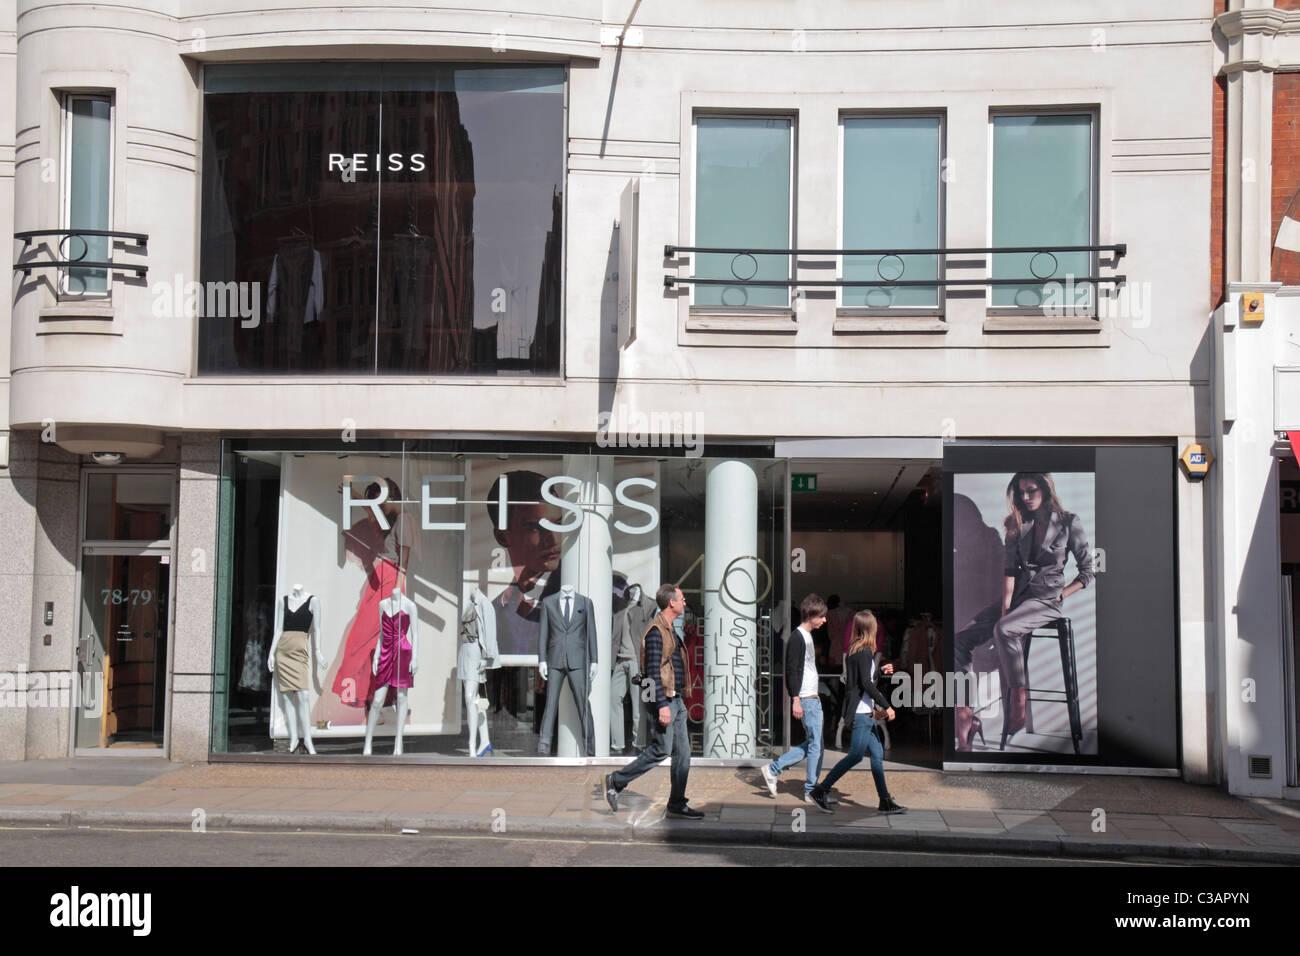 reiss fashion london